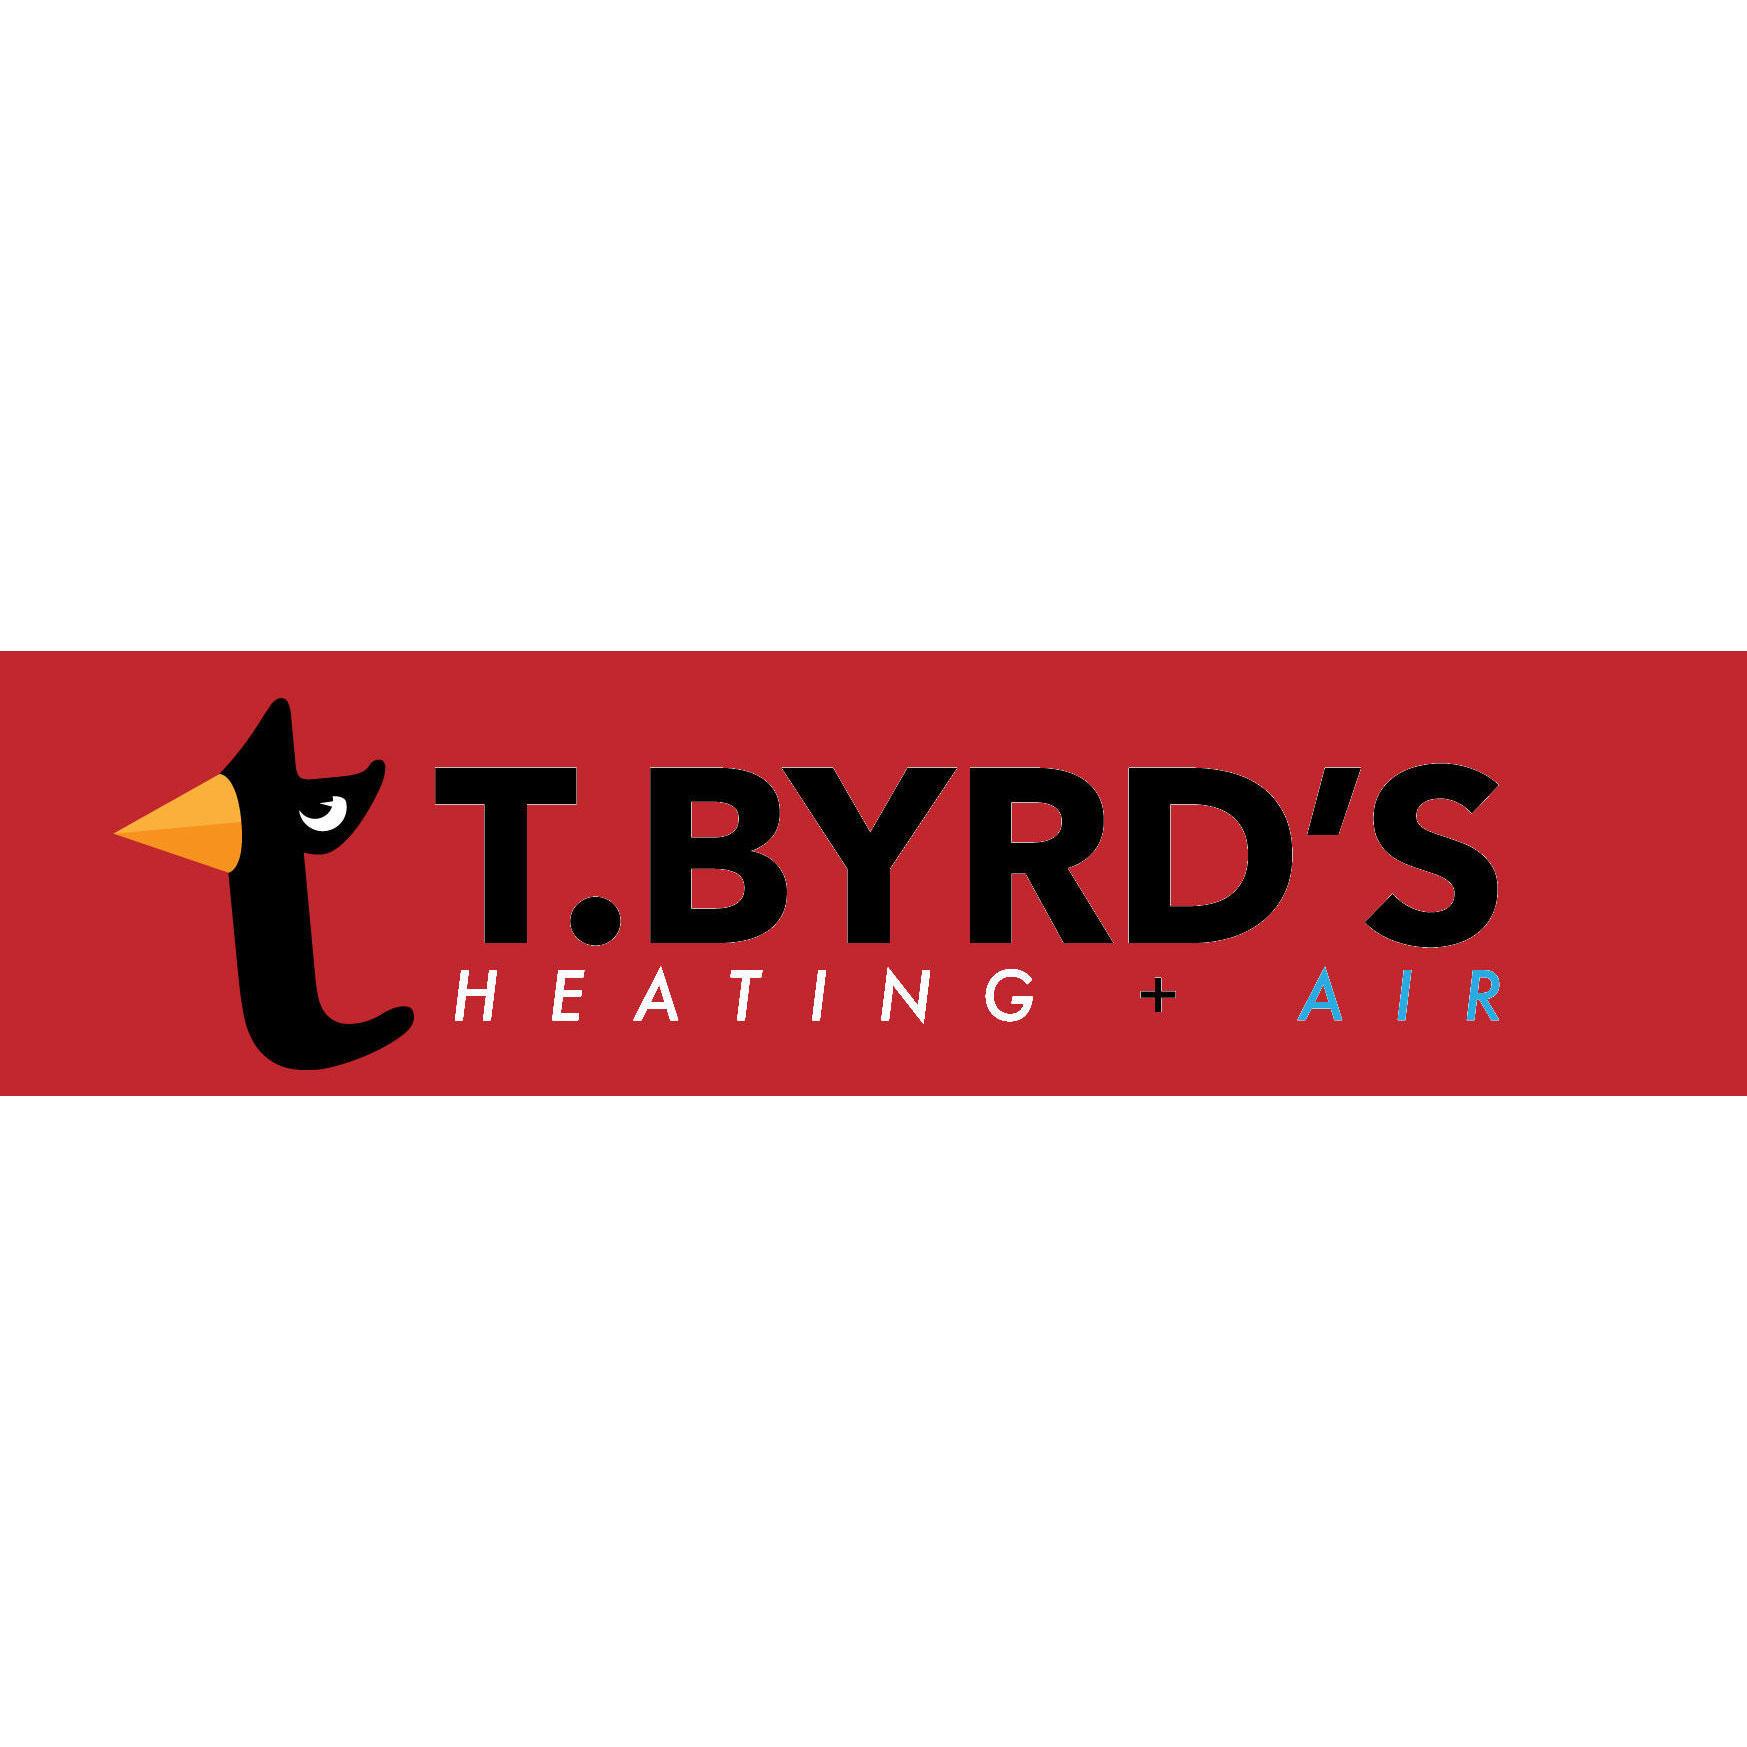 T. Byrd's Heating and Air LLC